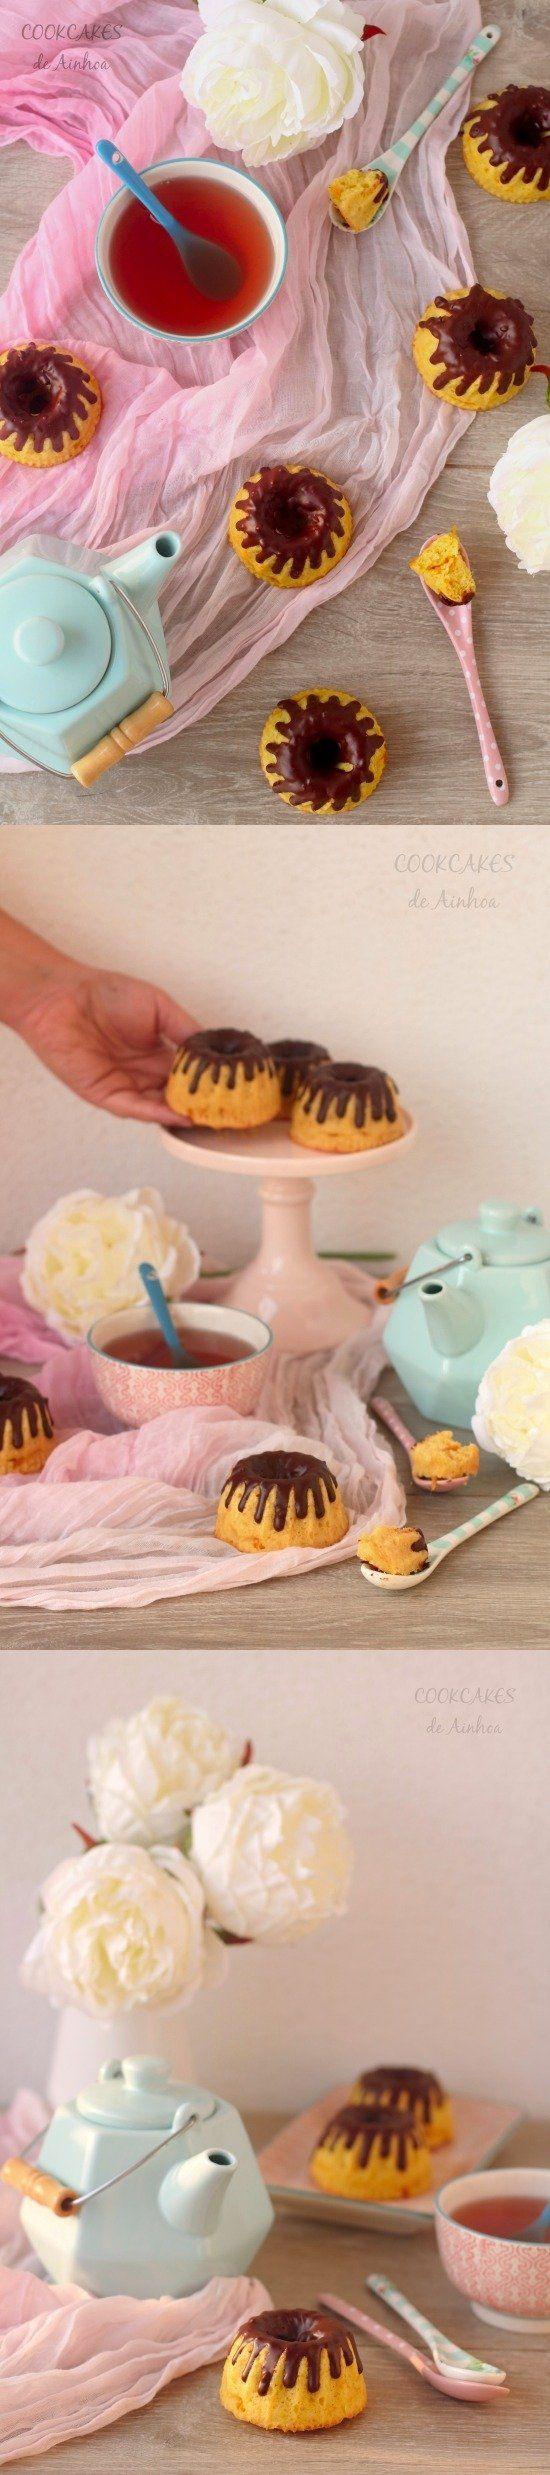 Esponjosos mini bizcochos de mango con chocolate / http://cookcakesdeainhoa.blogspot.com.es/